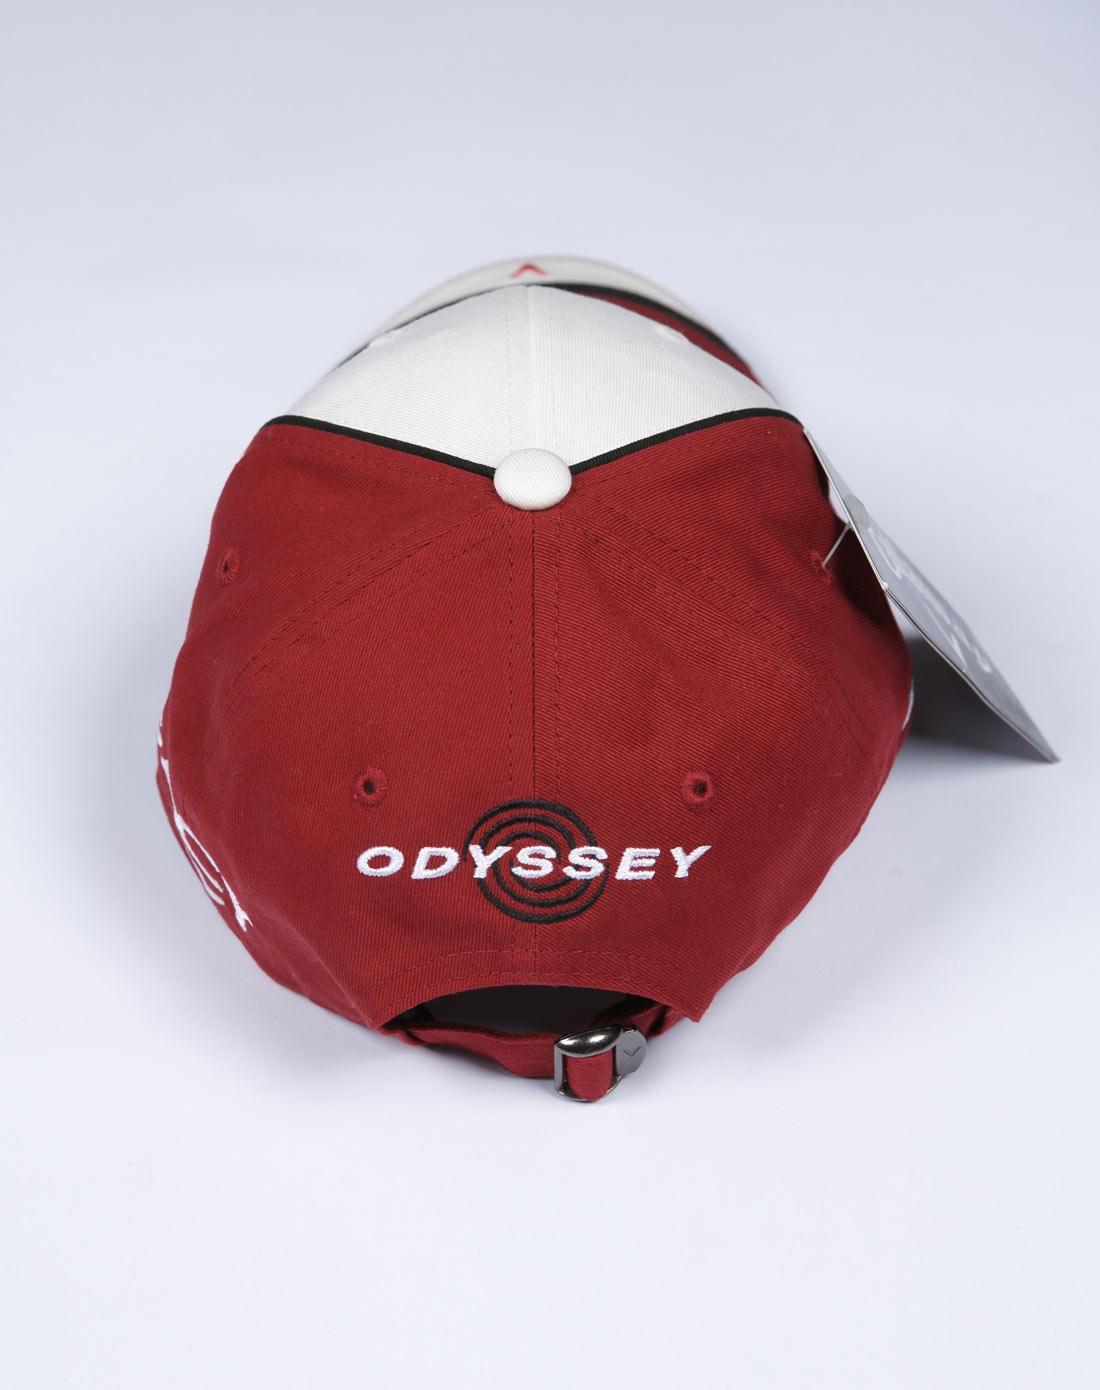 callaway男女男士红色帽子242mlg984608110